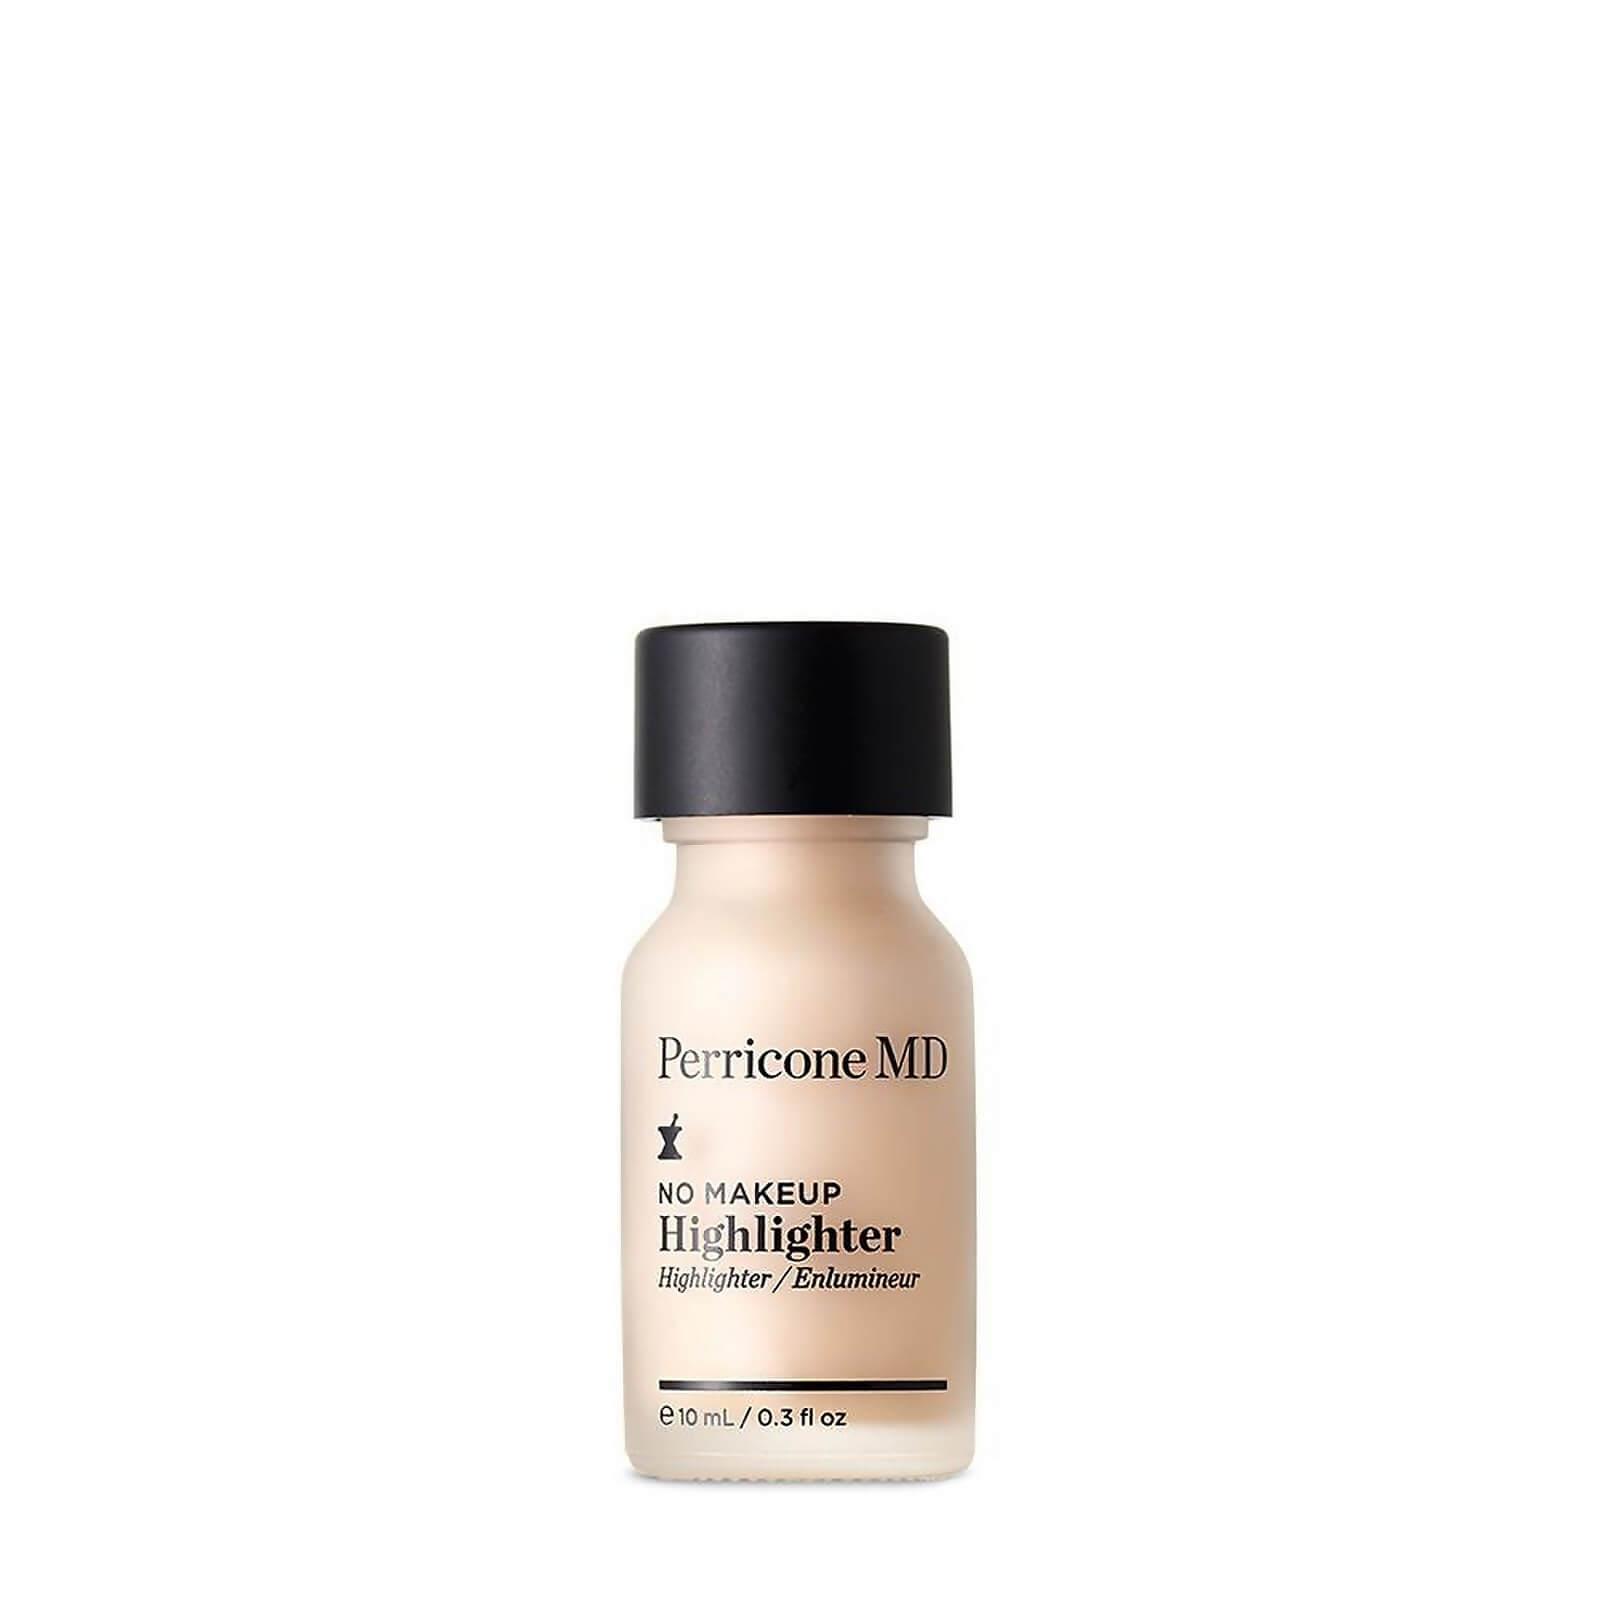 Купить Perricone MD No Makeup Skincare Highlighter 0.3 fl. oz